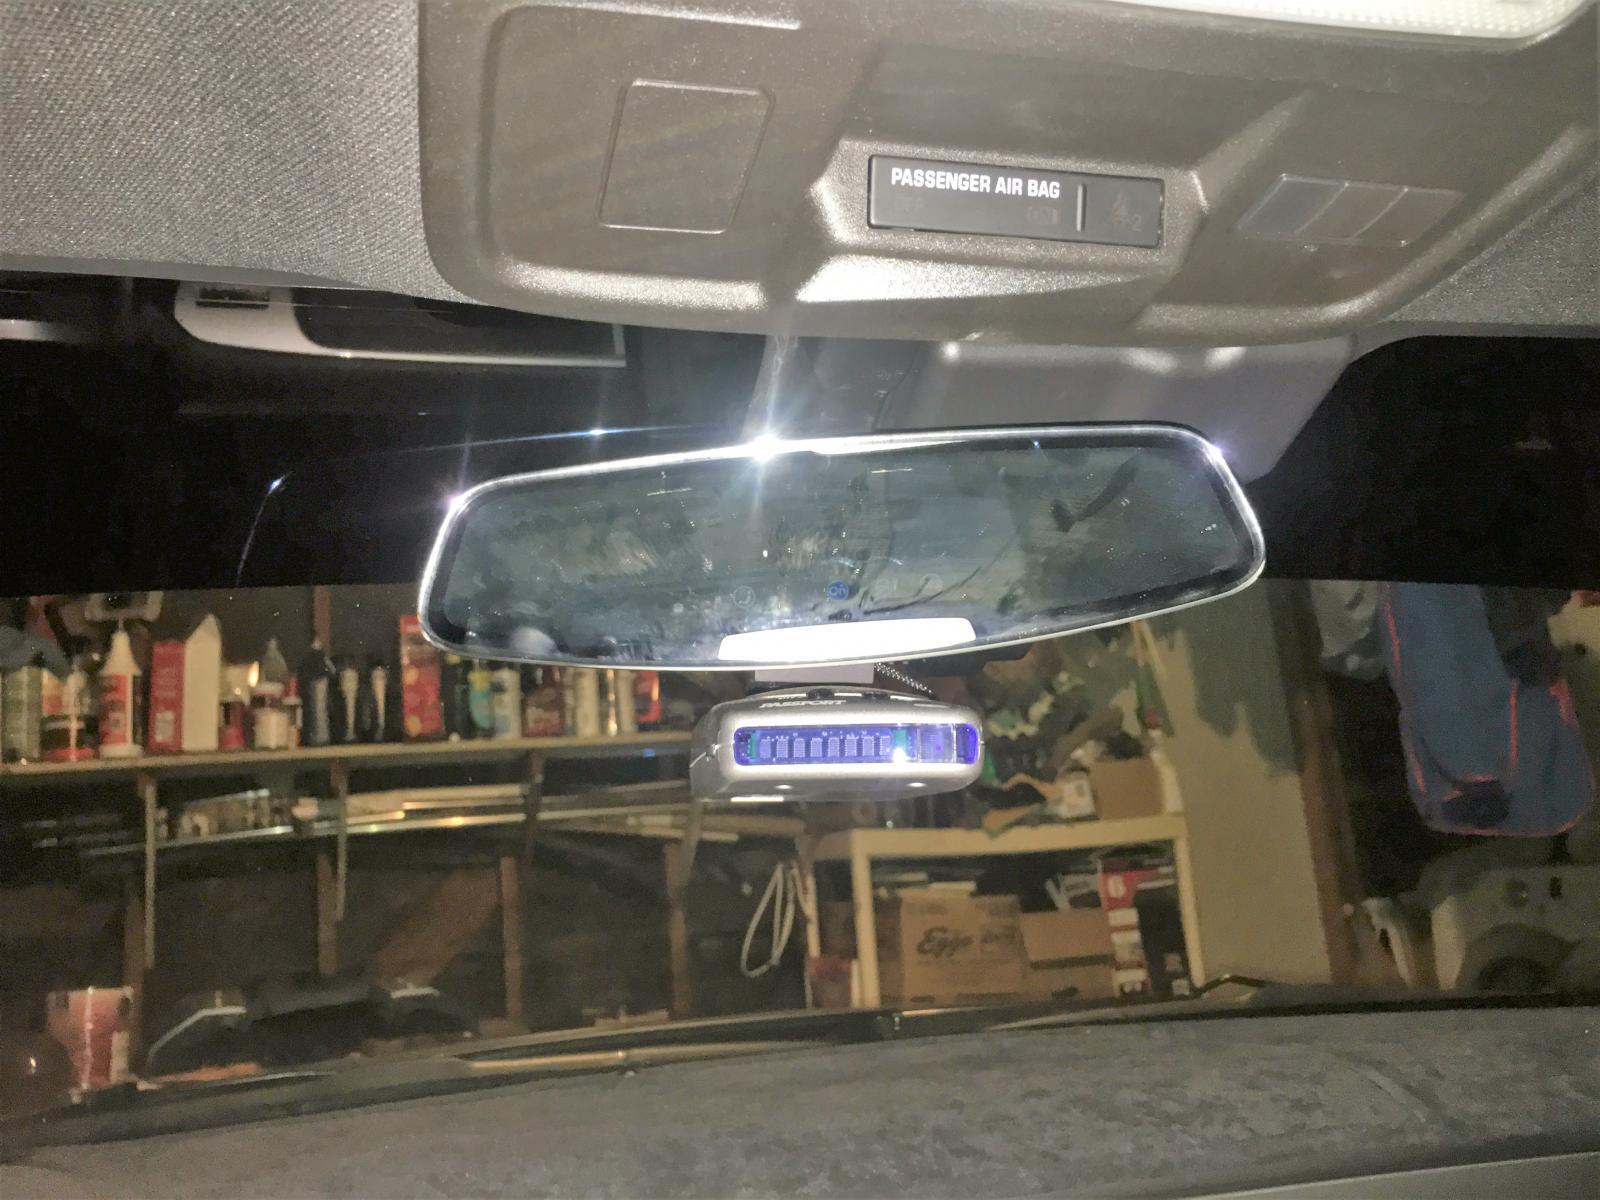 2014 Rear View Mirror Wiring Camaro5 Chevy Camaro Forum Onstar Diagram Name Img 0229 Views 416 Size 2089 Kb